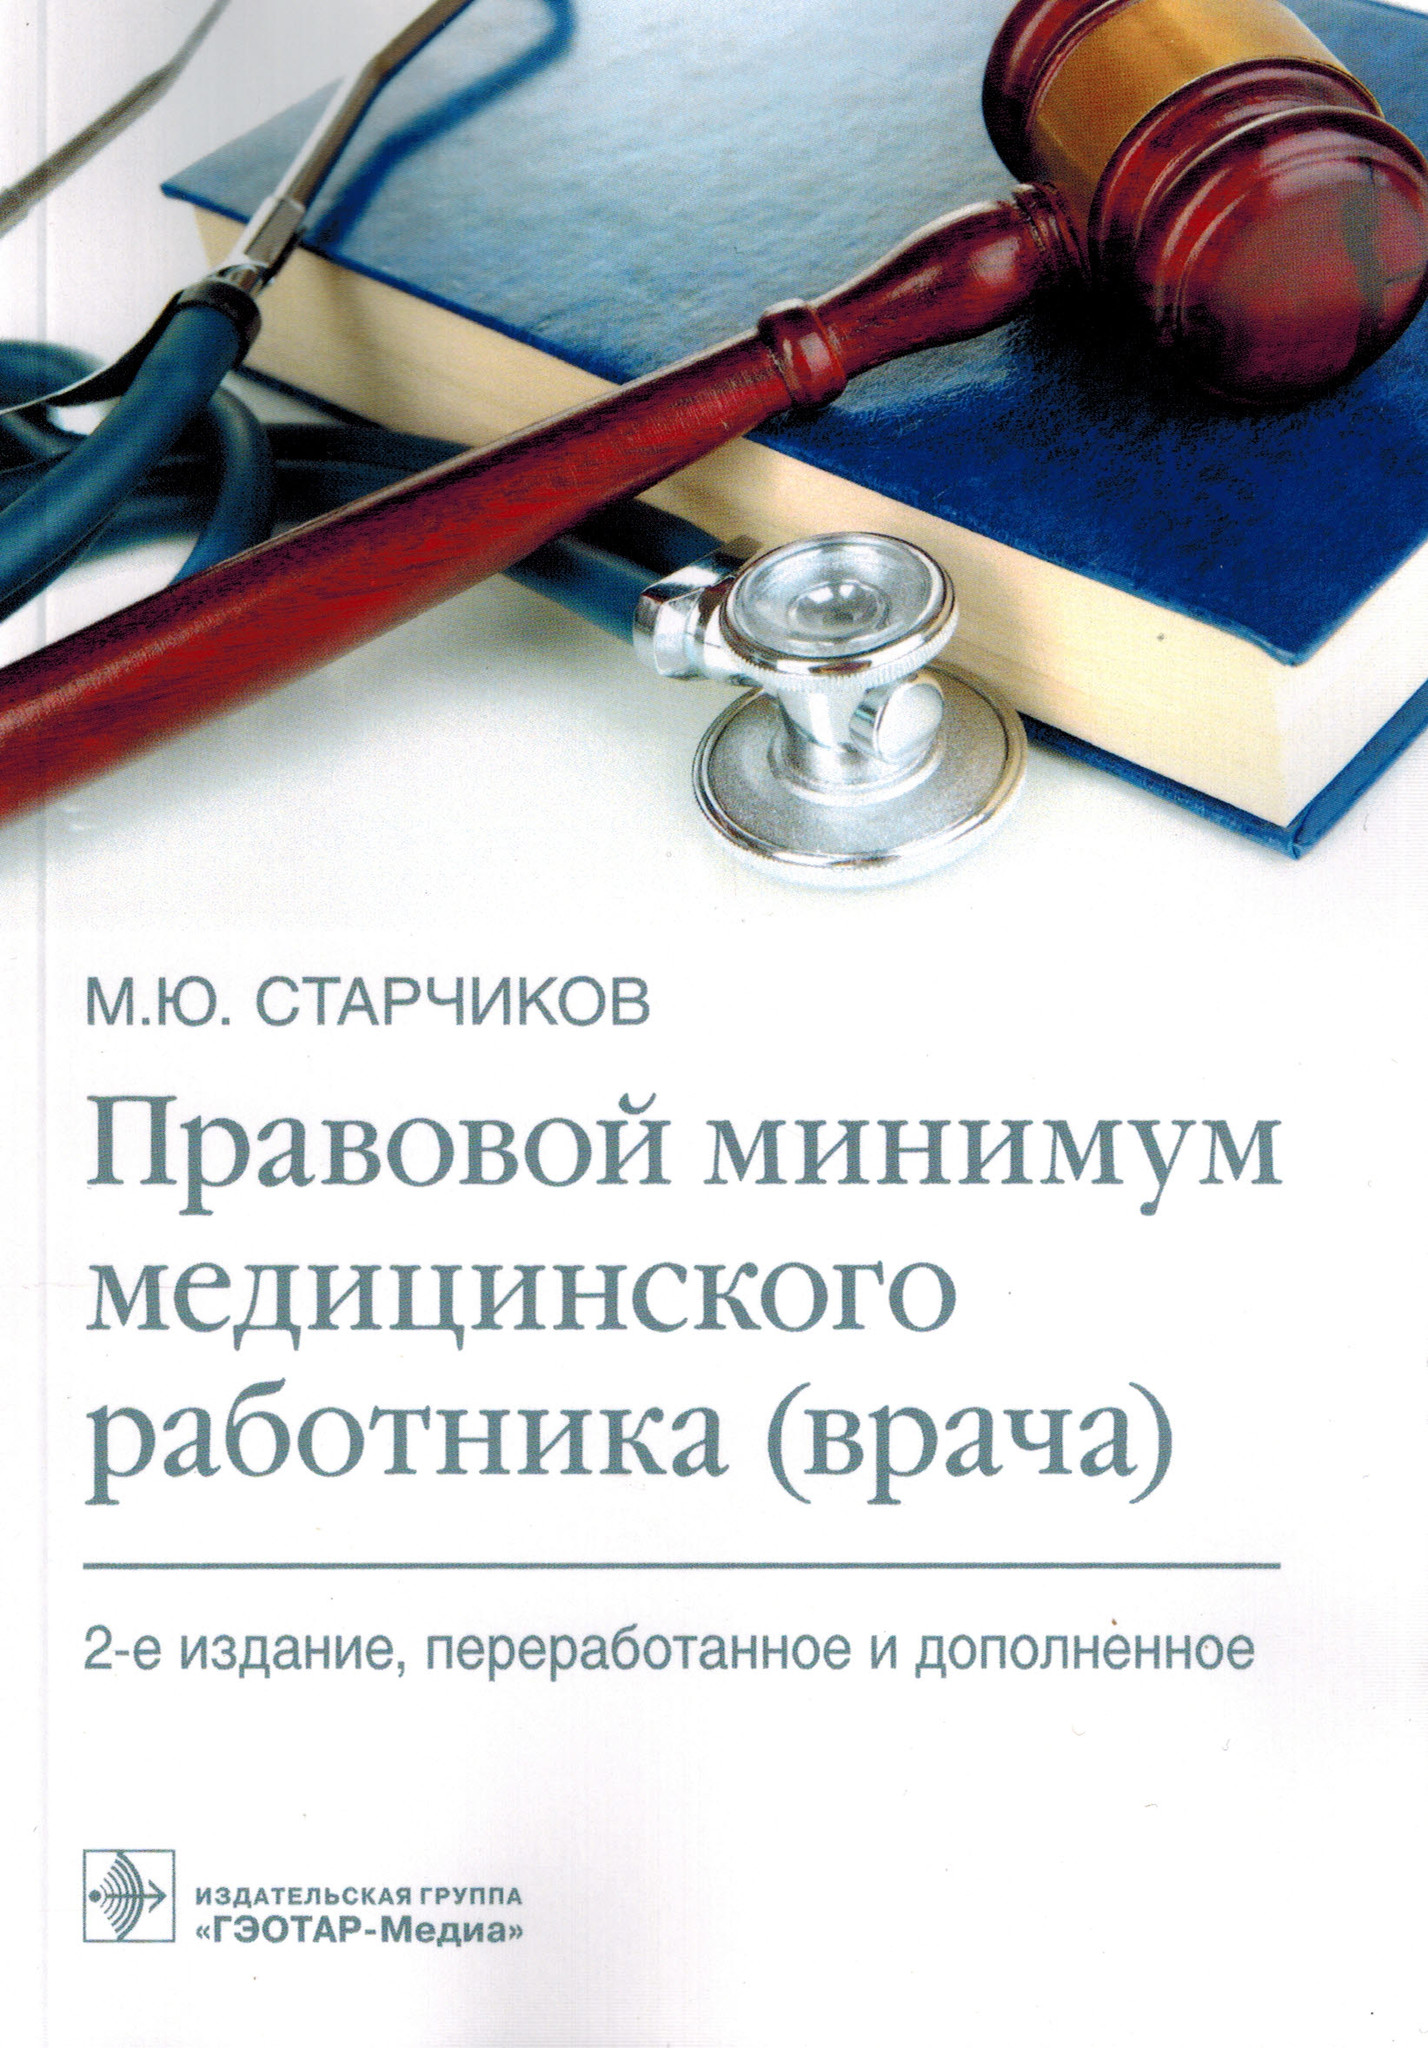 Оргздрав, право, статистика Правовой минимум медицинского работника (врача) pmmr.jpg